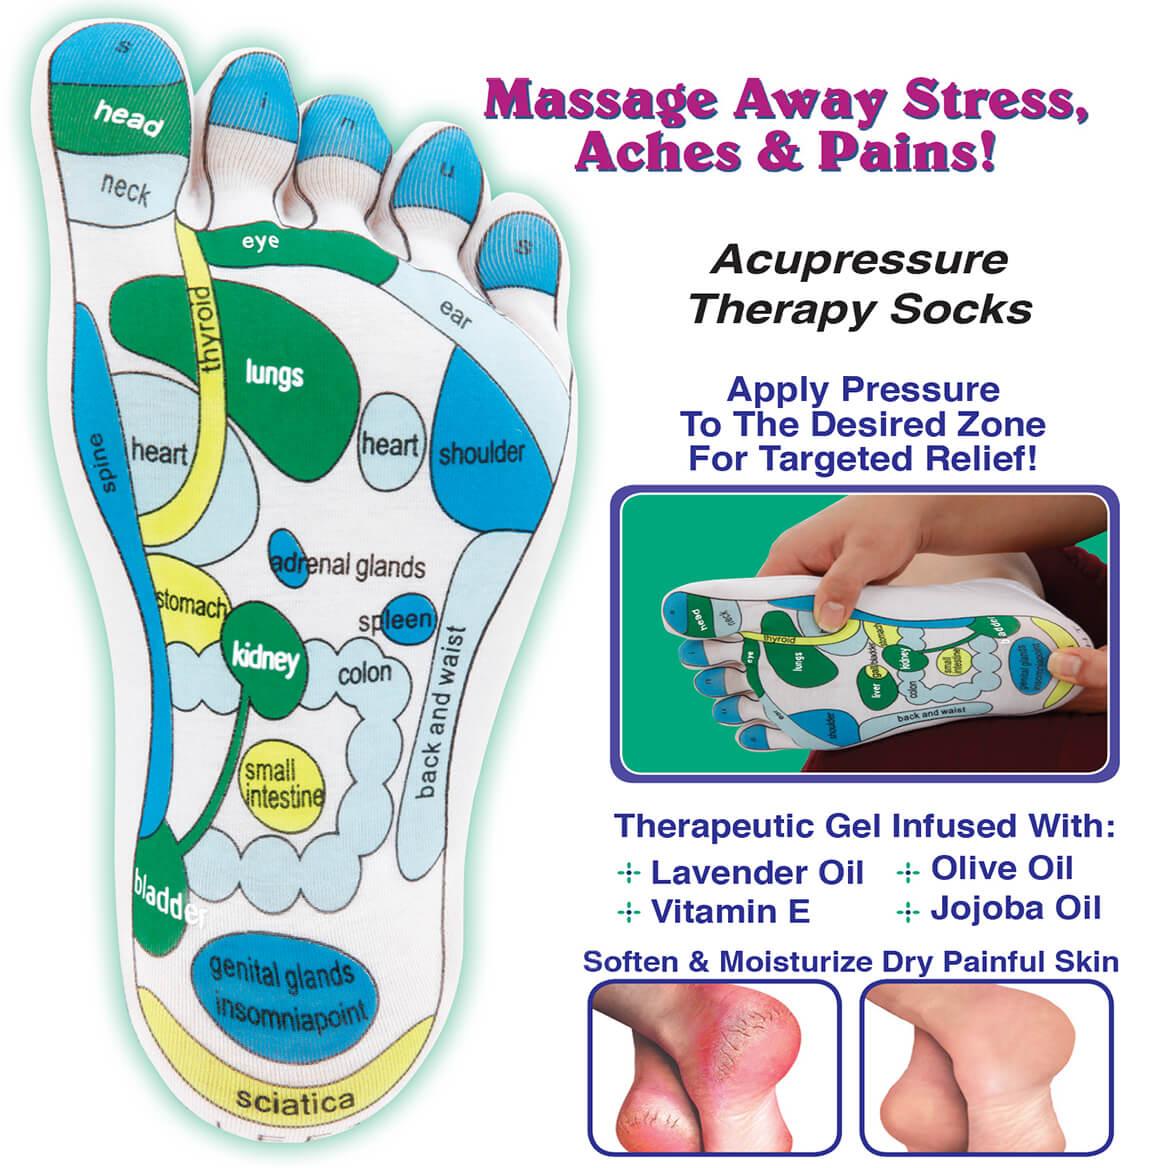 Acupressure Therapy Socks Pair-370139